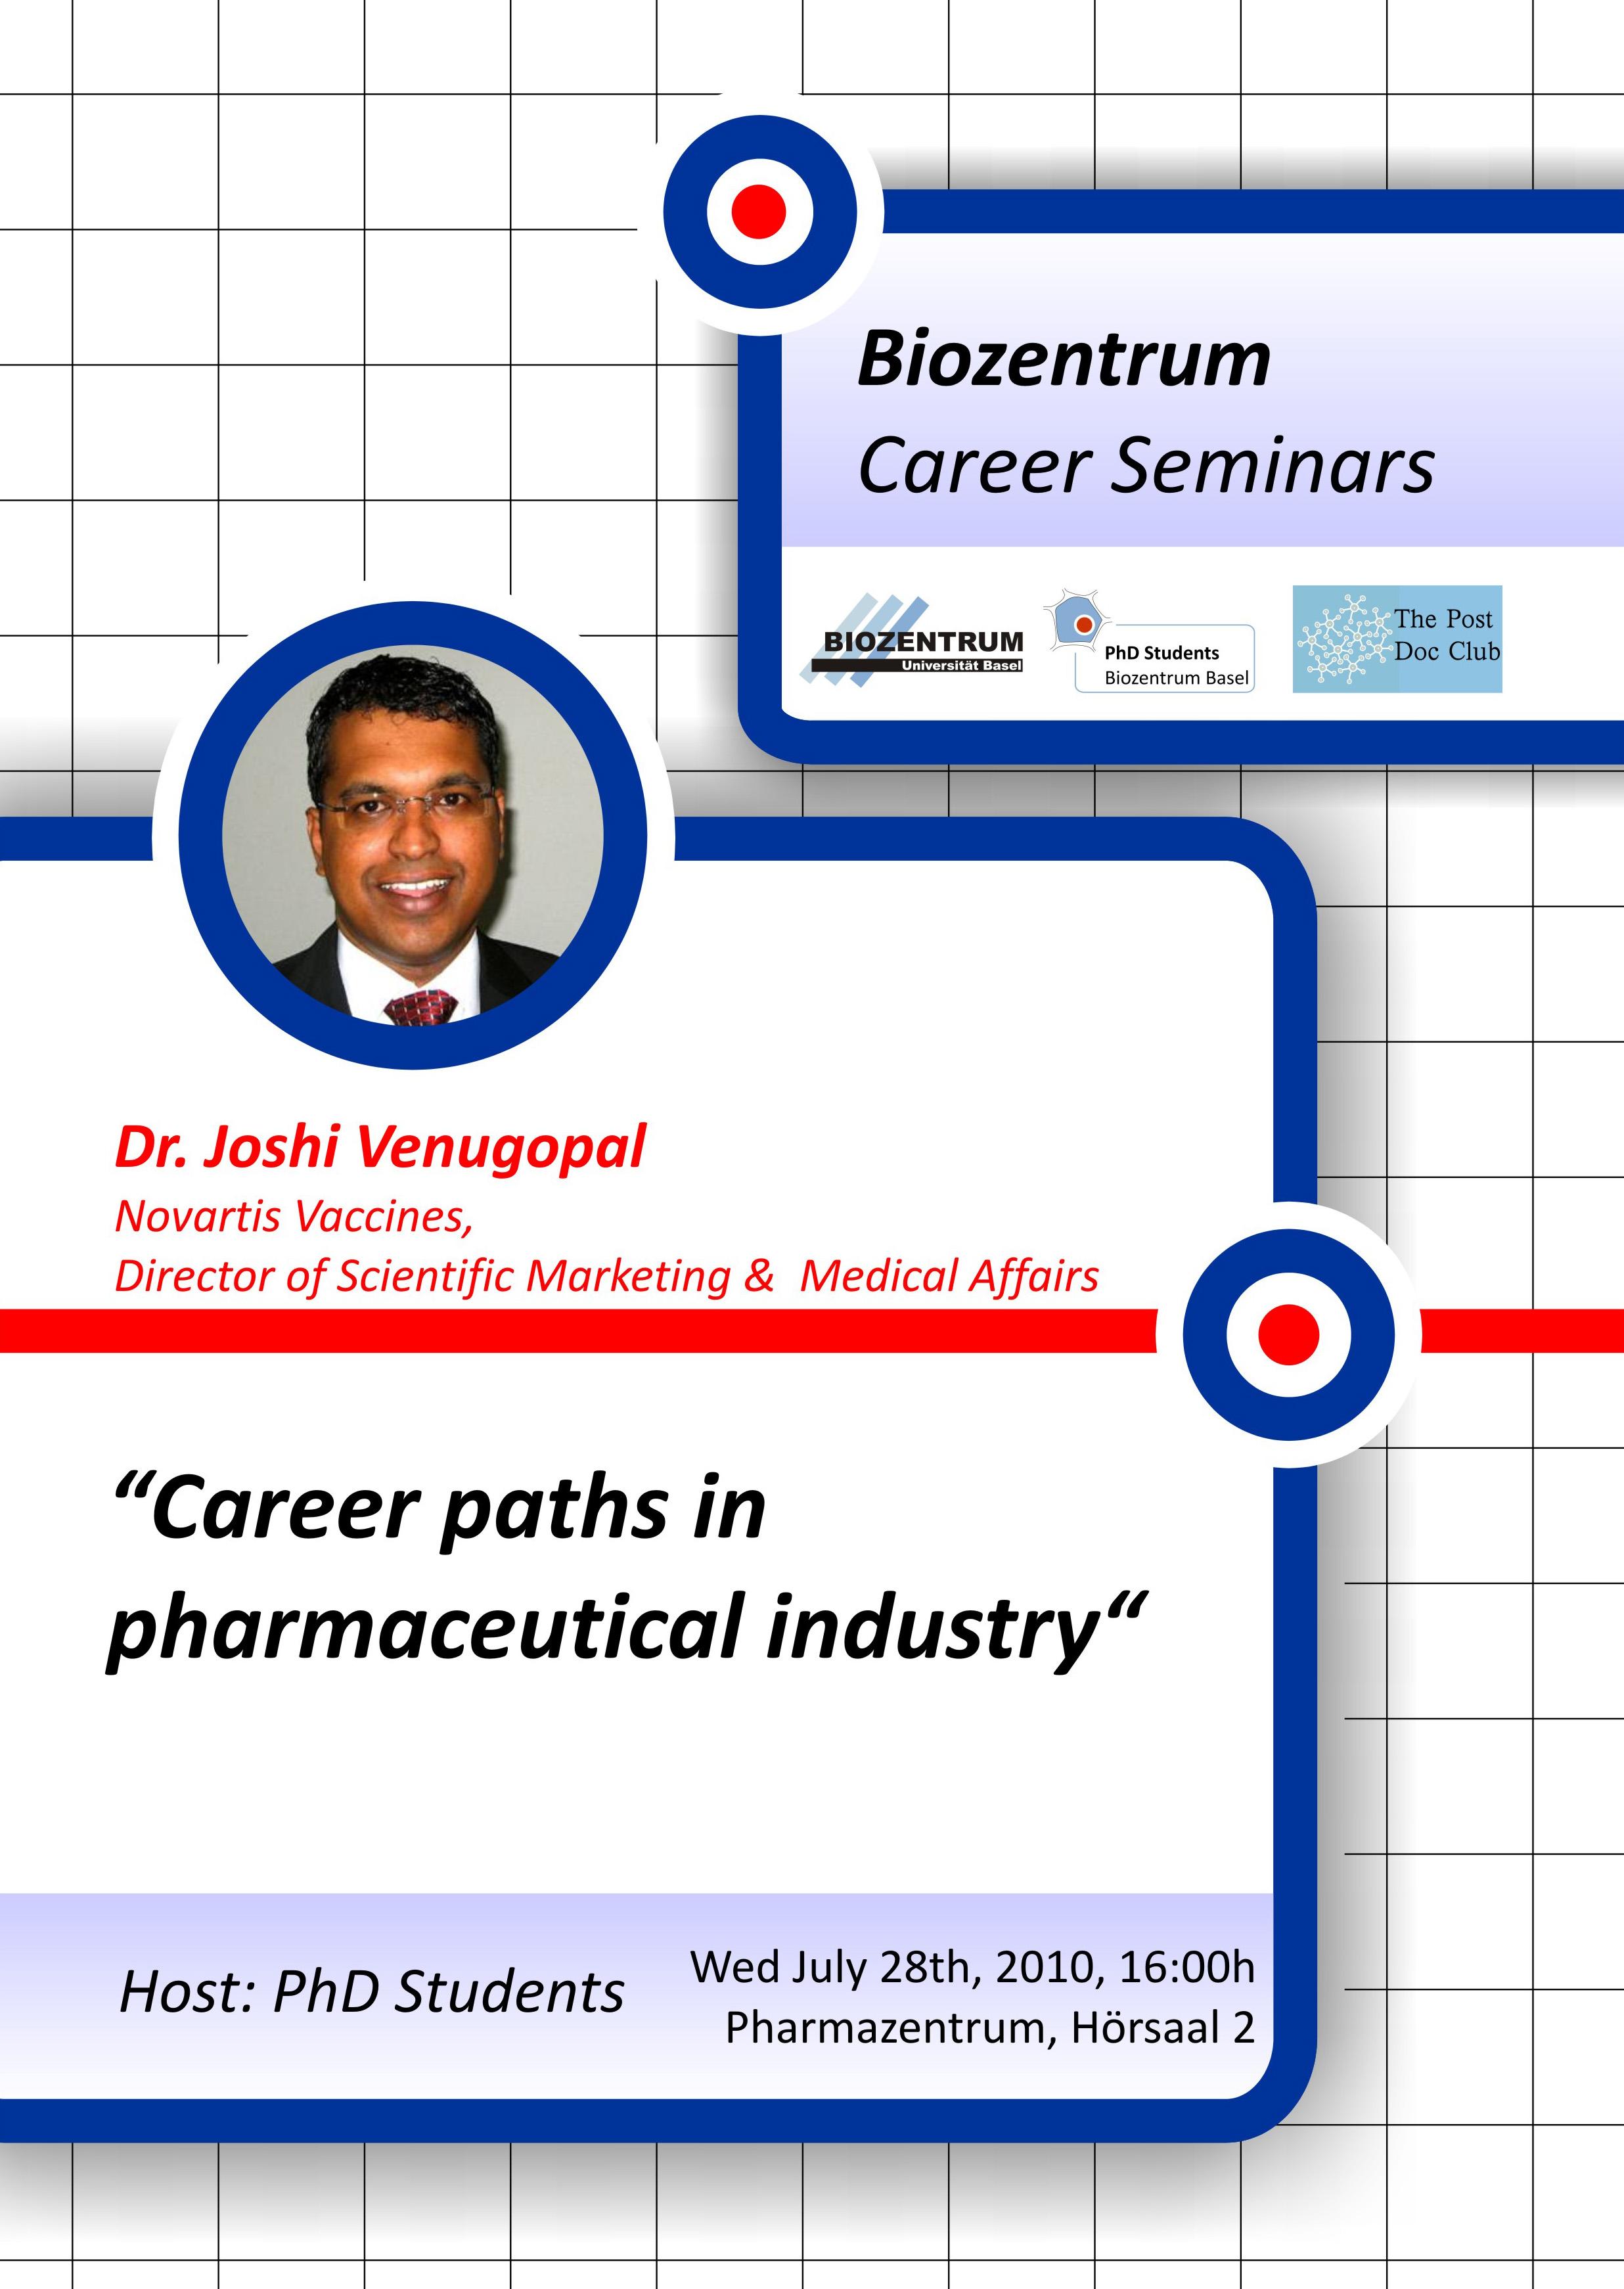 flyer-bz-career-seminar